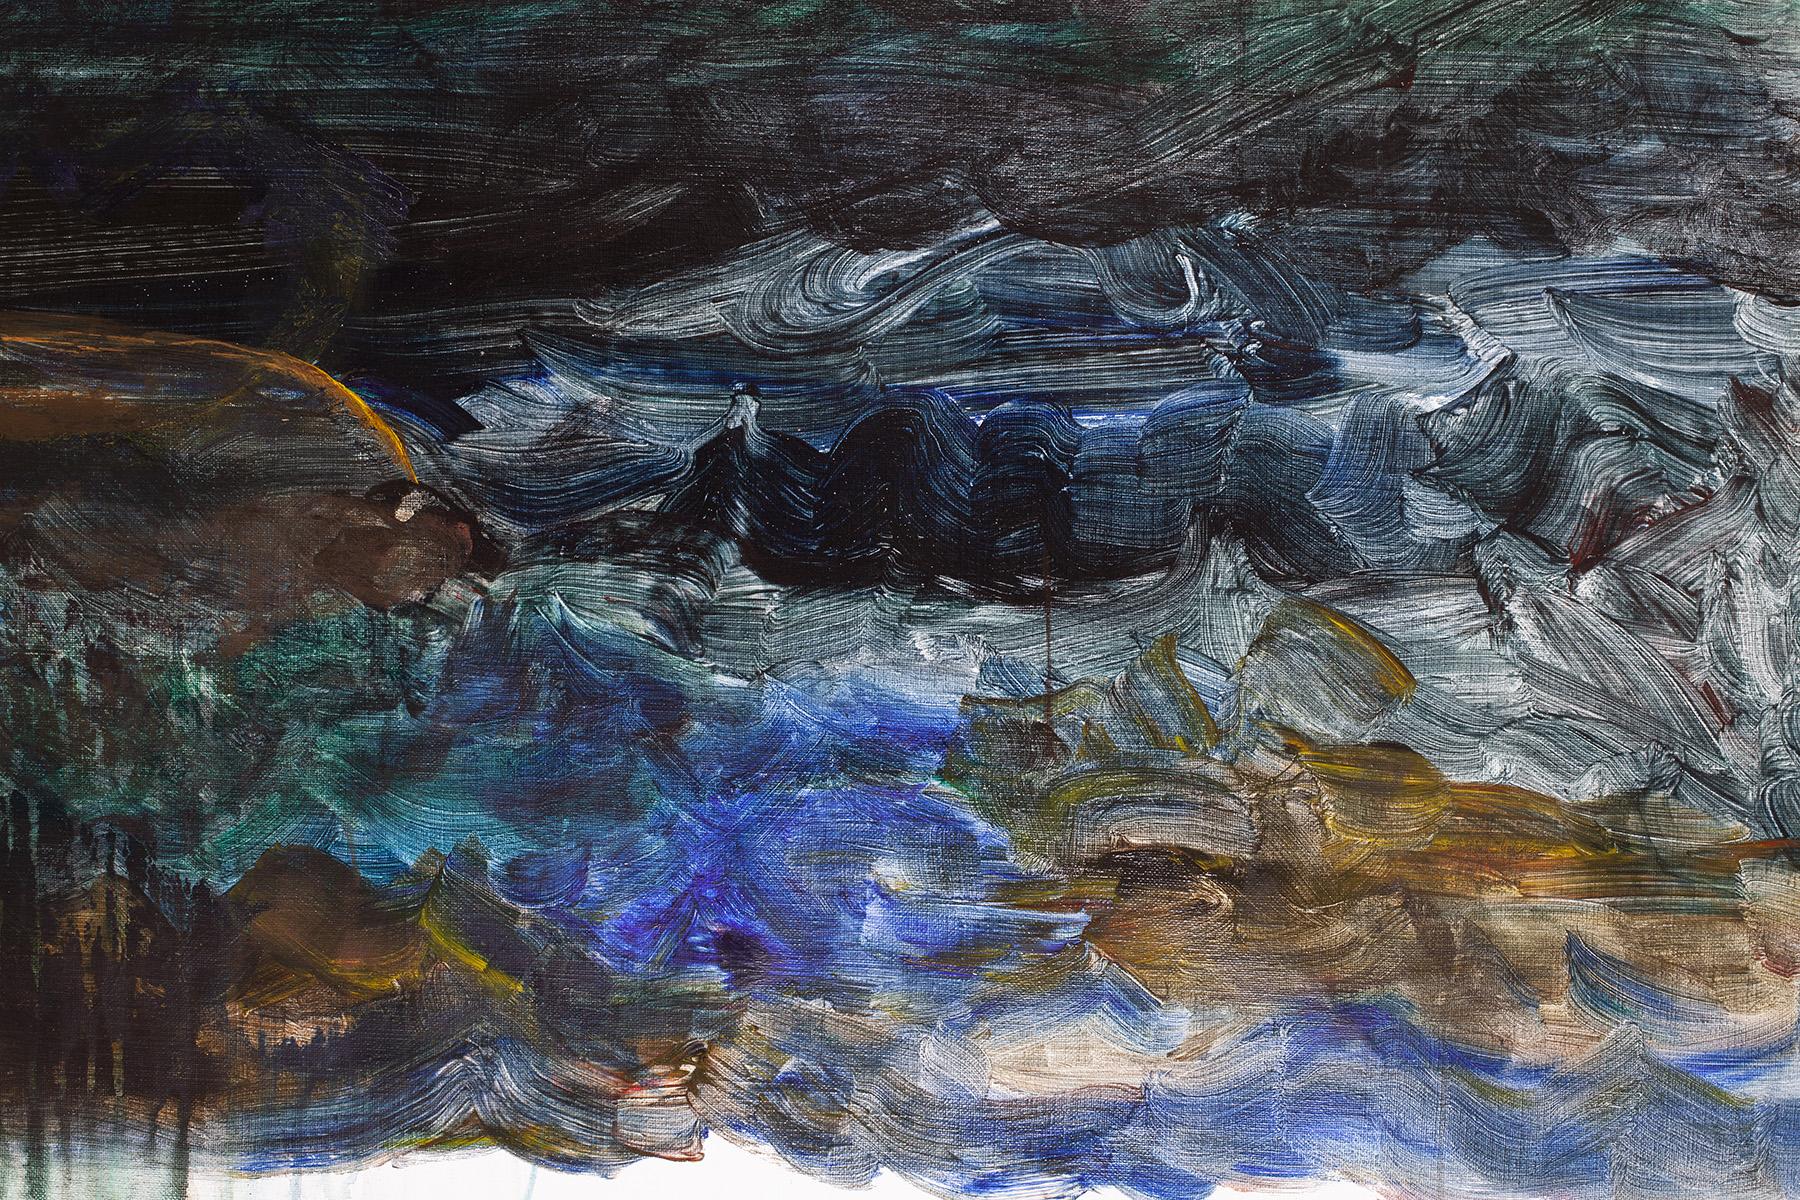 11.) Ono, Boat Sinking. 2018.  Acrylic on canvas, 38.25 in x 53 in (97.2 cm x 134.6 cm) copy.jpg